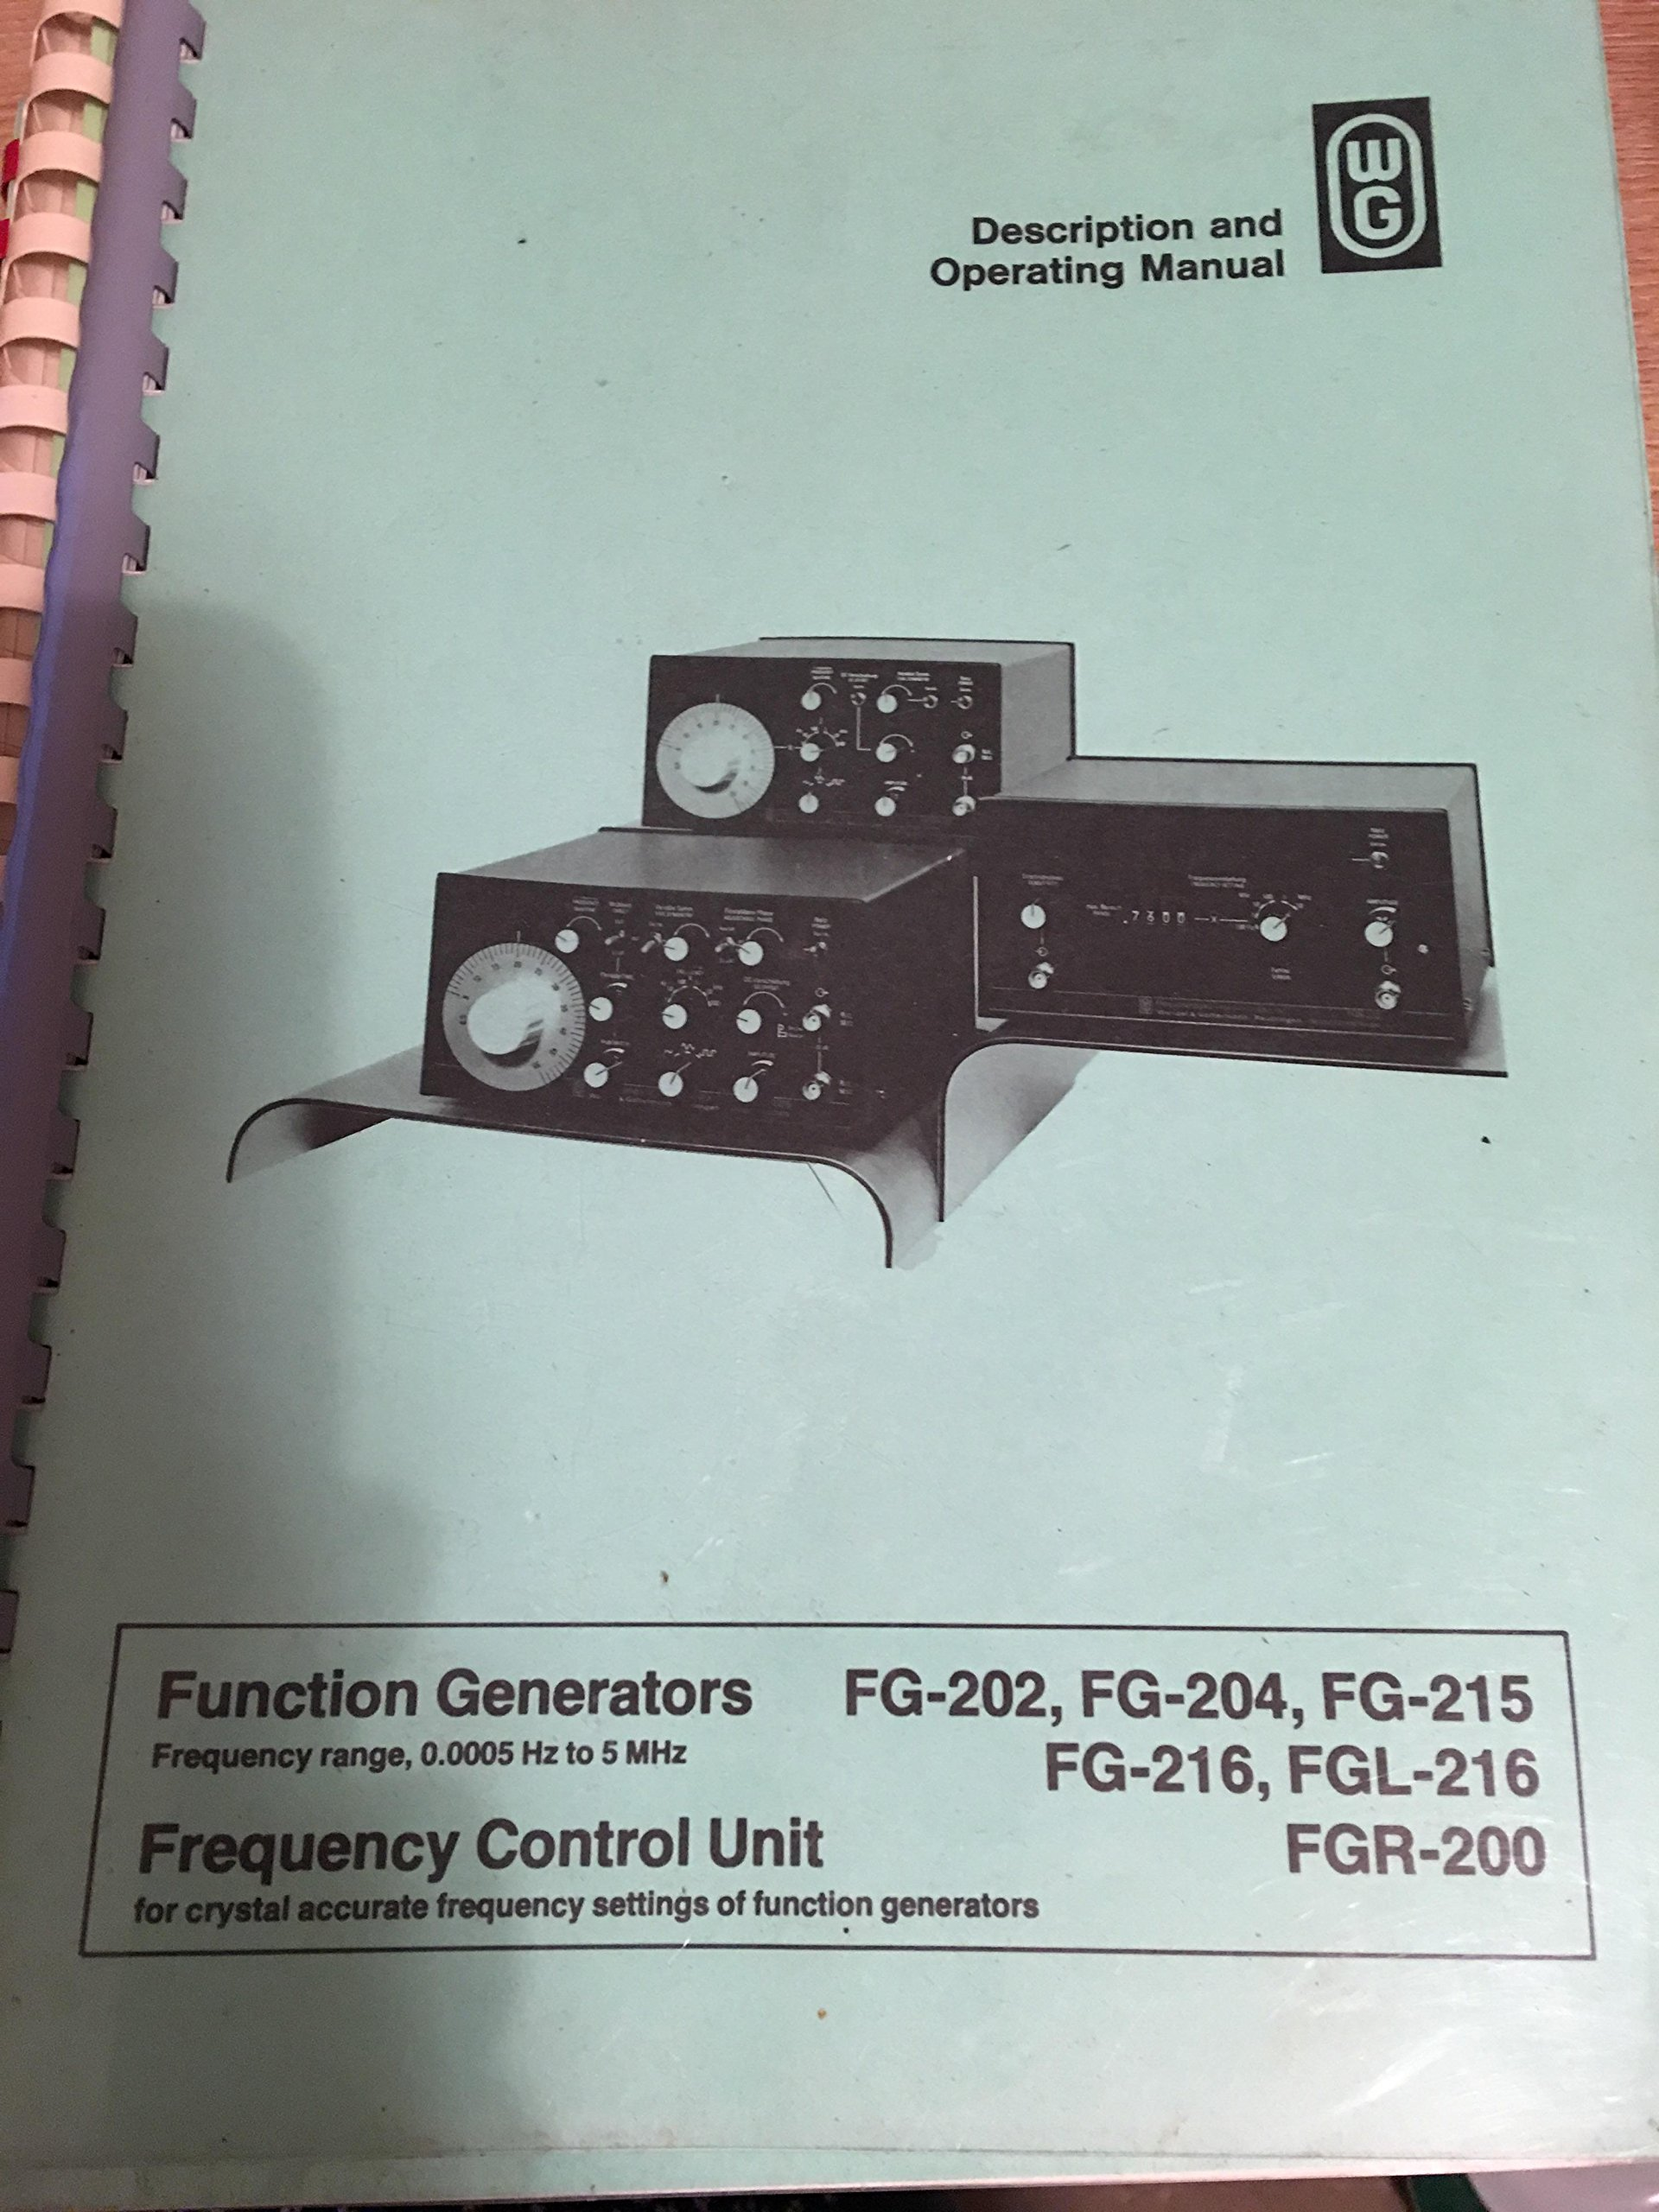 Wg Function Generators Frequency Control Unit Description And Operating Manual Fg 202 204 215 216 Fgl Fgr 200 Wandel